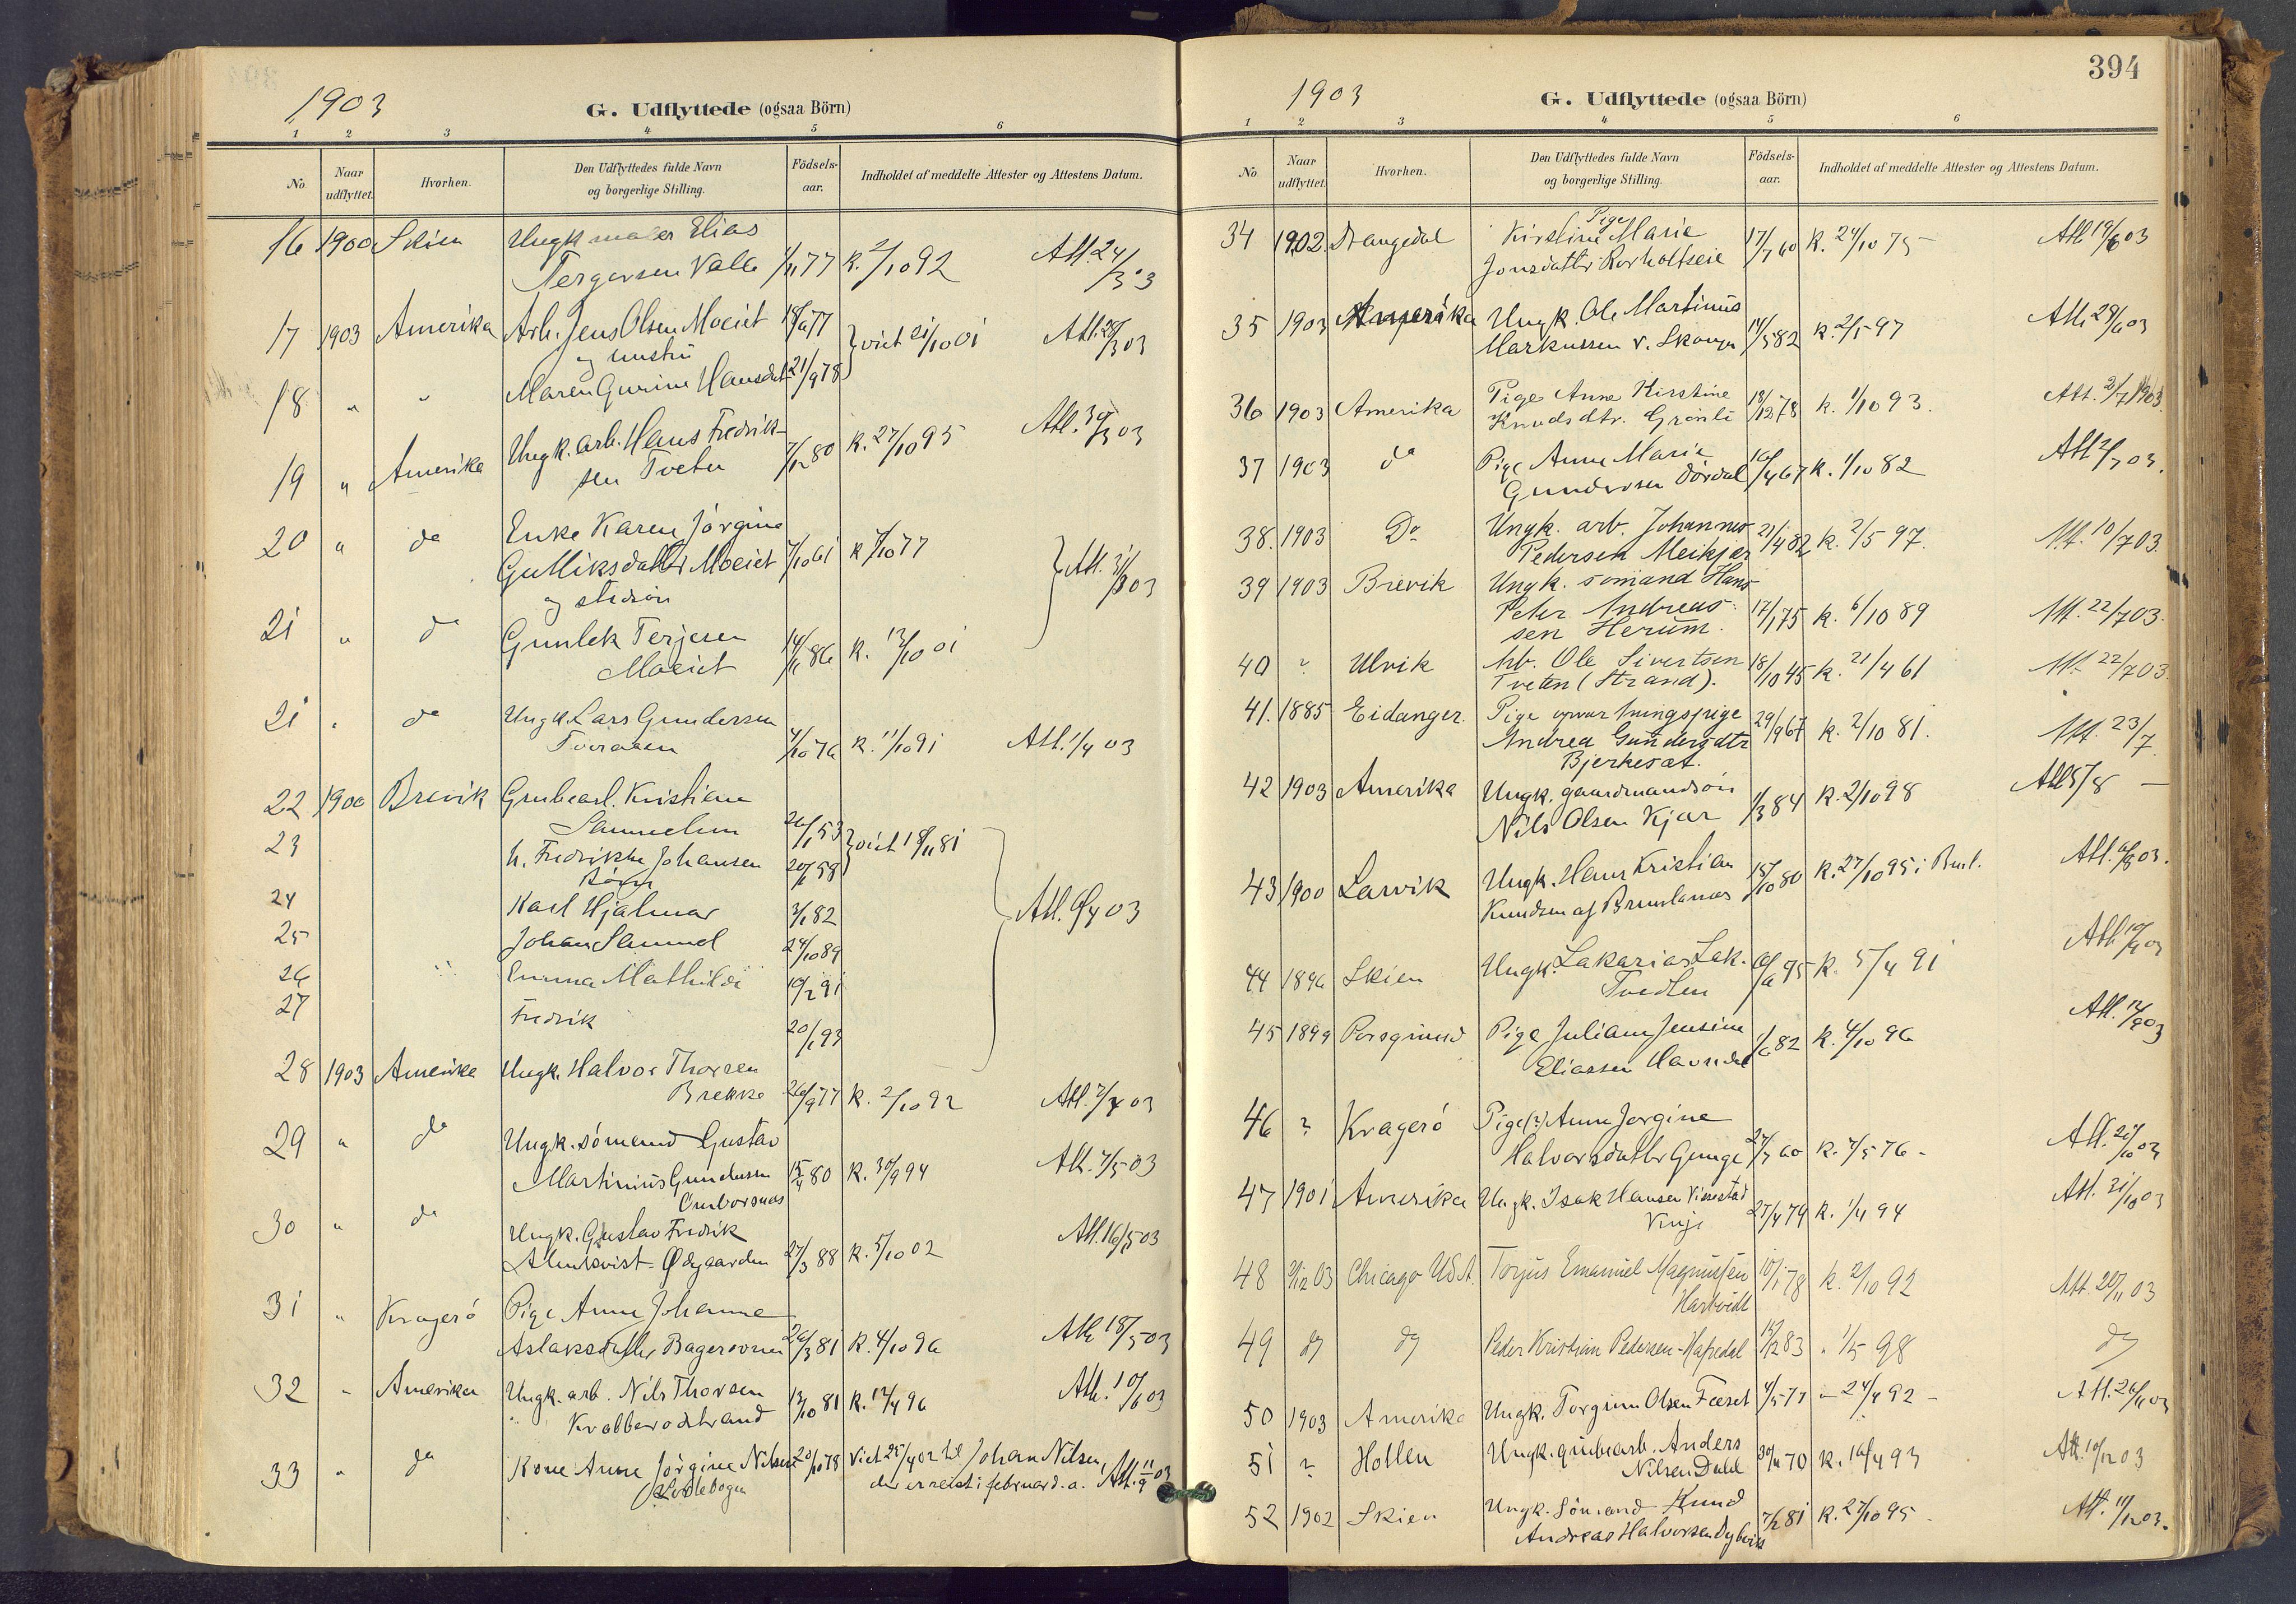 SAKO, Bamble kirkebøker, F/Fa/L0009: Ministerialbok nr. I 9, 1901-1917, s. 394